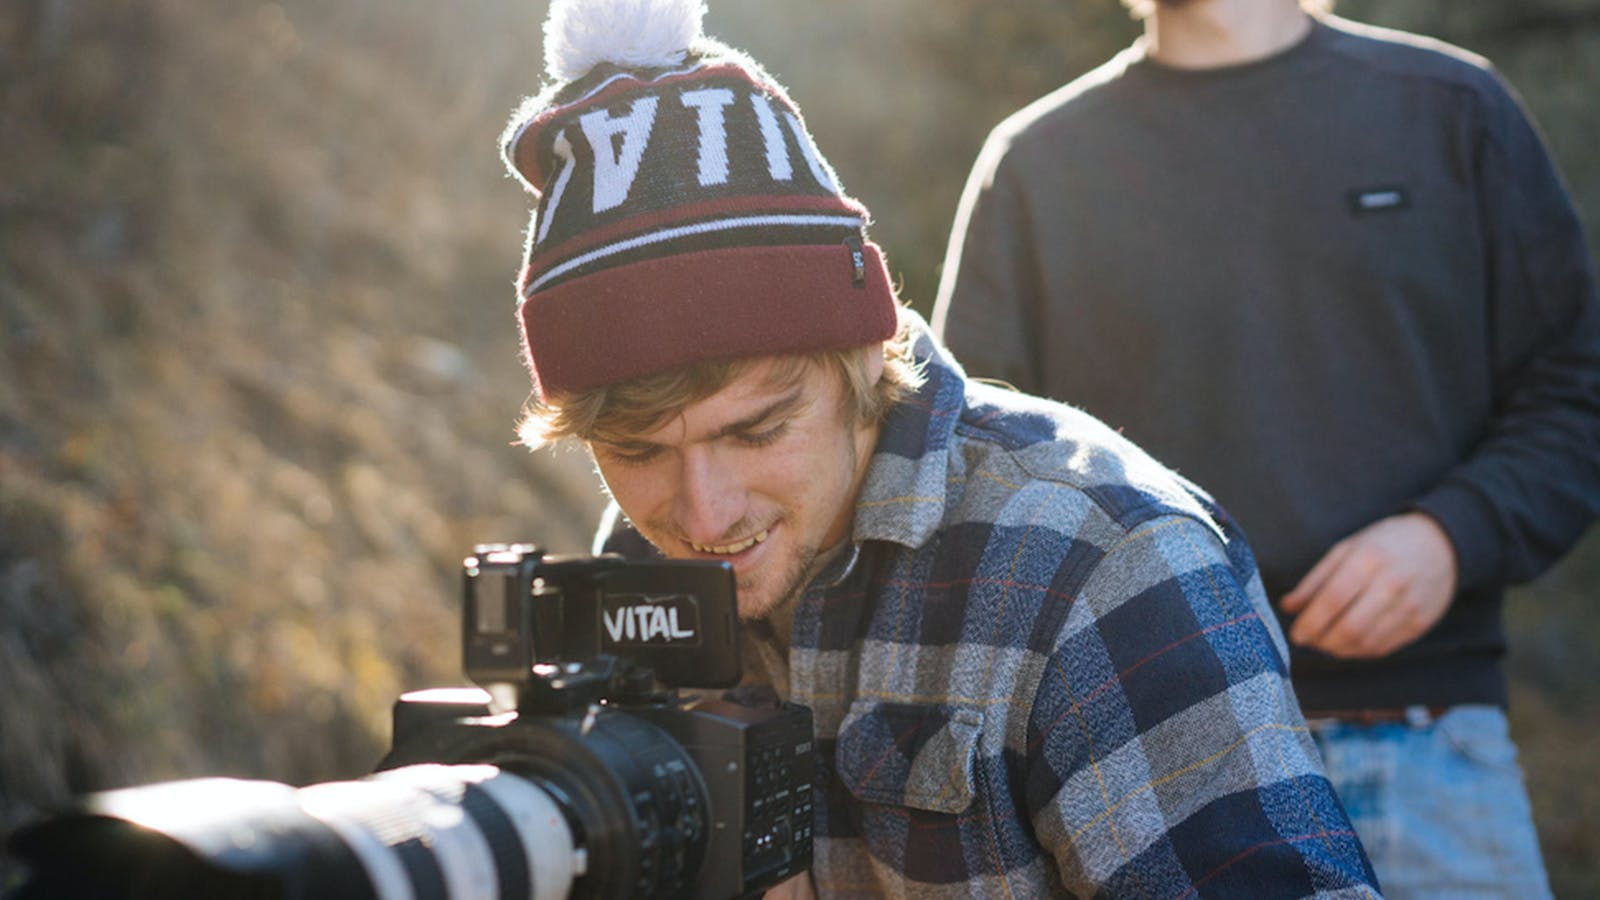 Steel City Media filmmaker and founder Joe Bowman